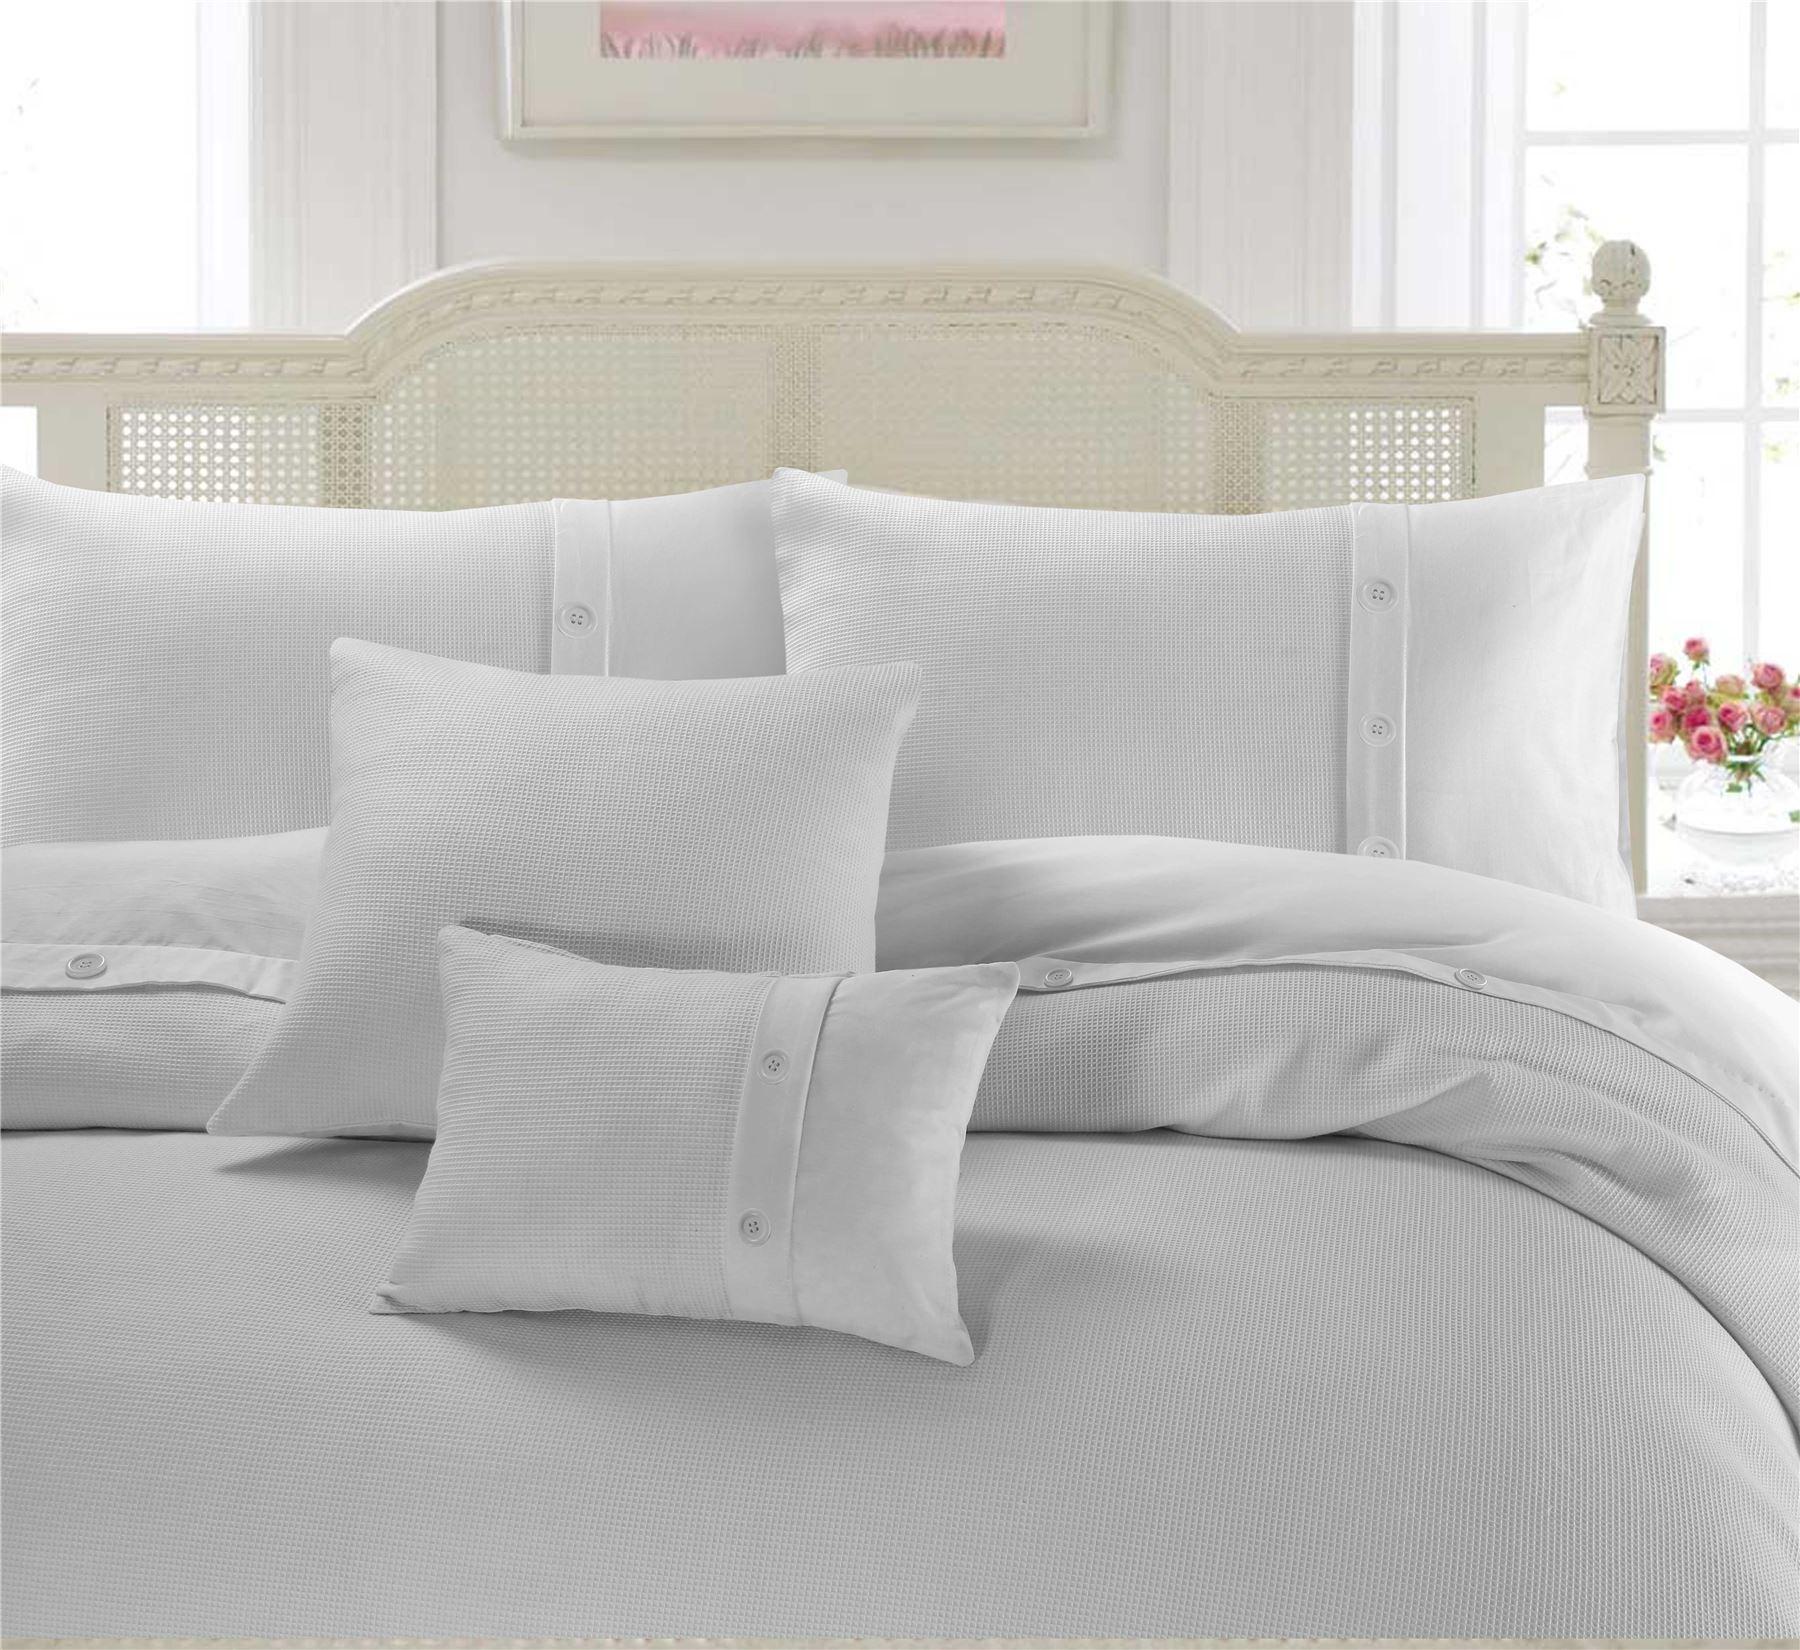 Nimsay Home Bordered Waffle 100 Cotton Duvet Cover Set Ebay